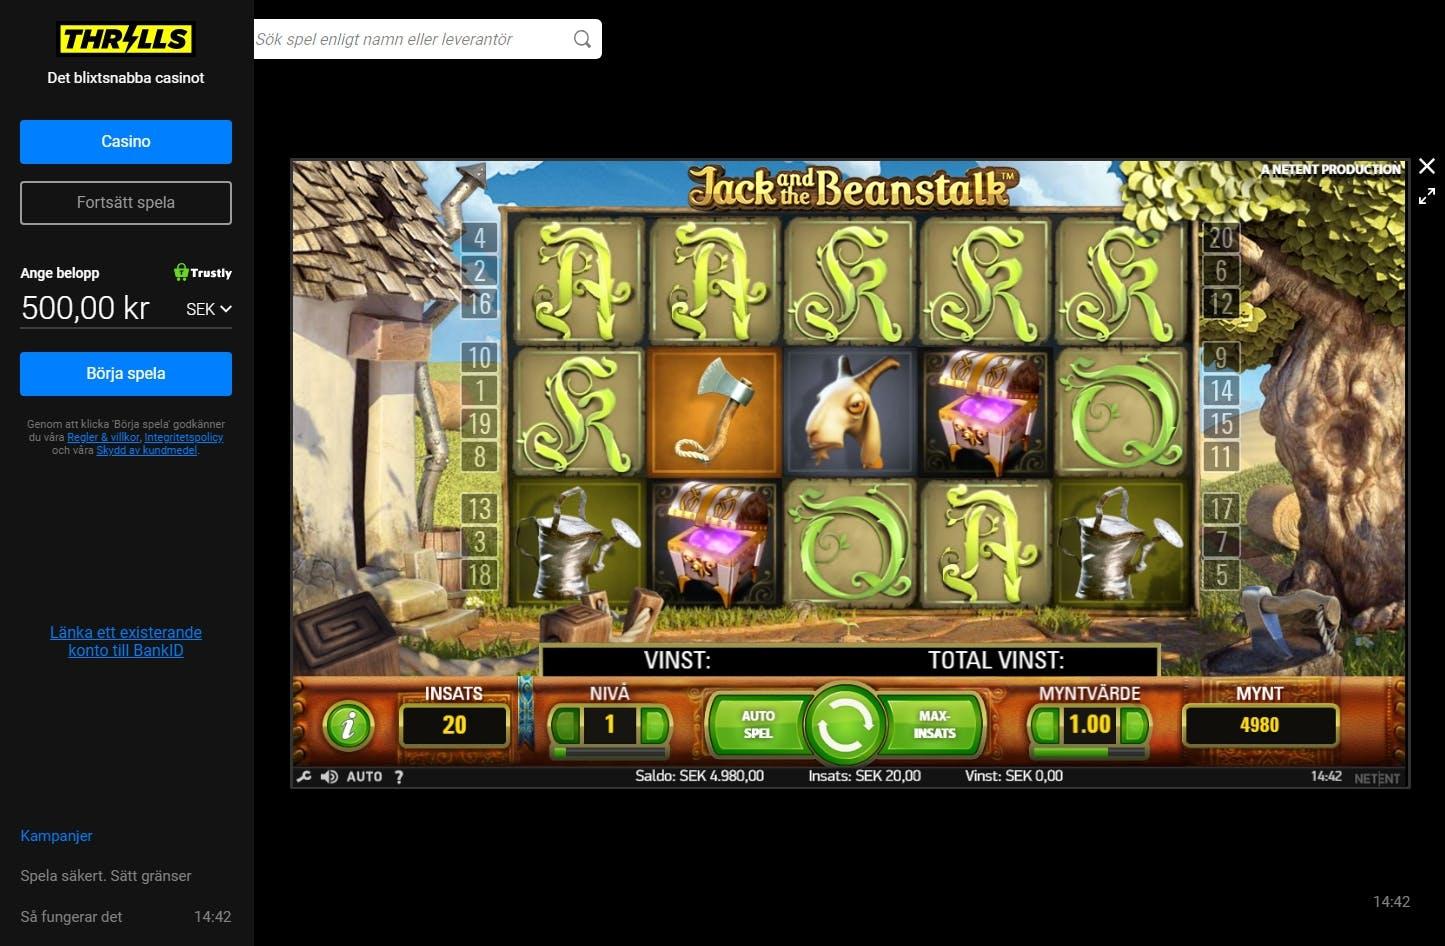 Spela casino iPad Turbico progressiv